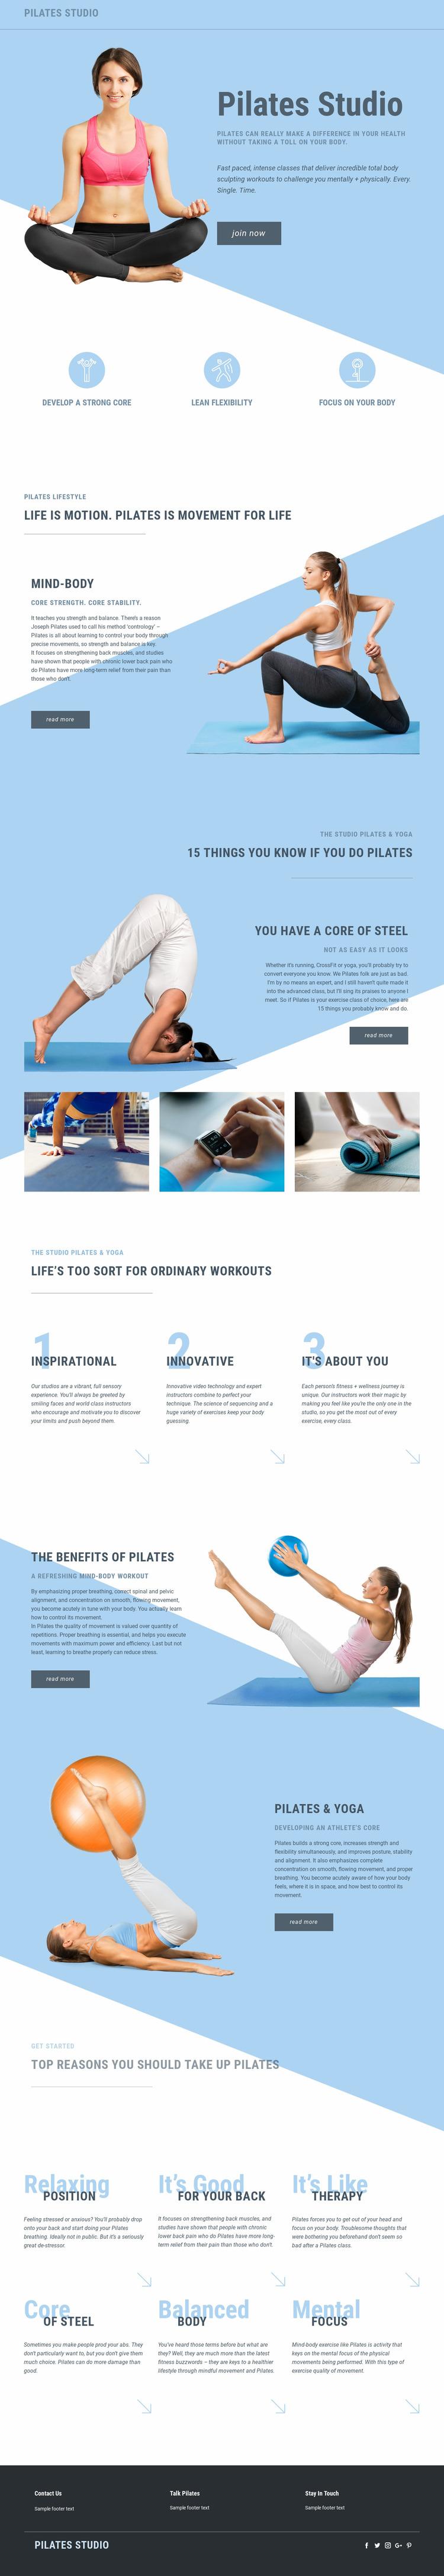 Pilates studio and sports Website Mockup